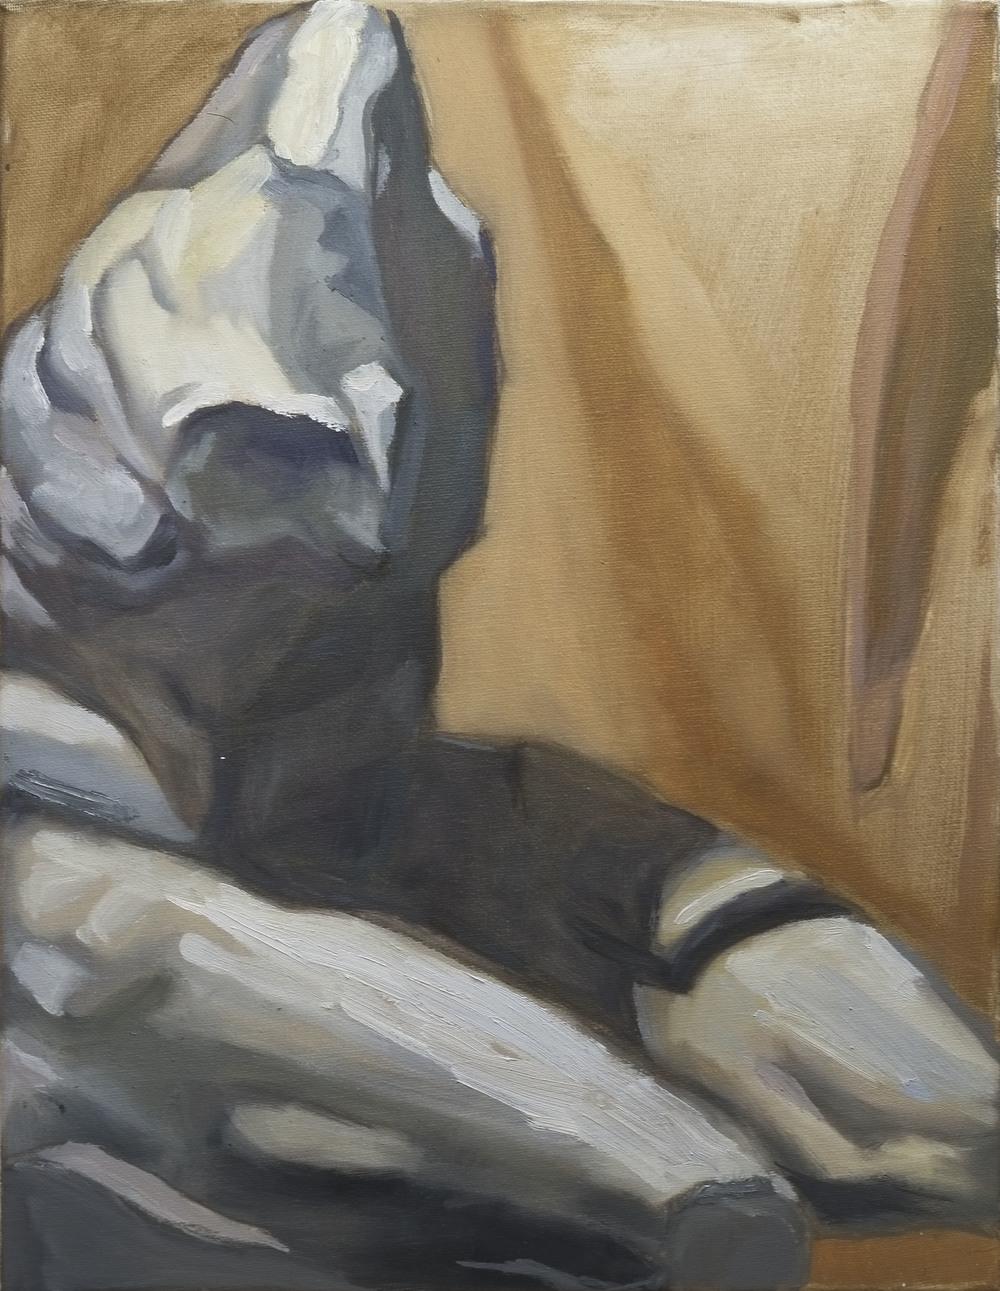 painting1_maletorso.JPG